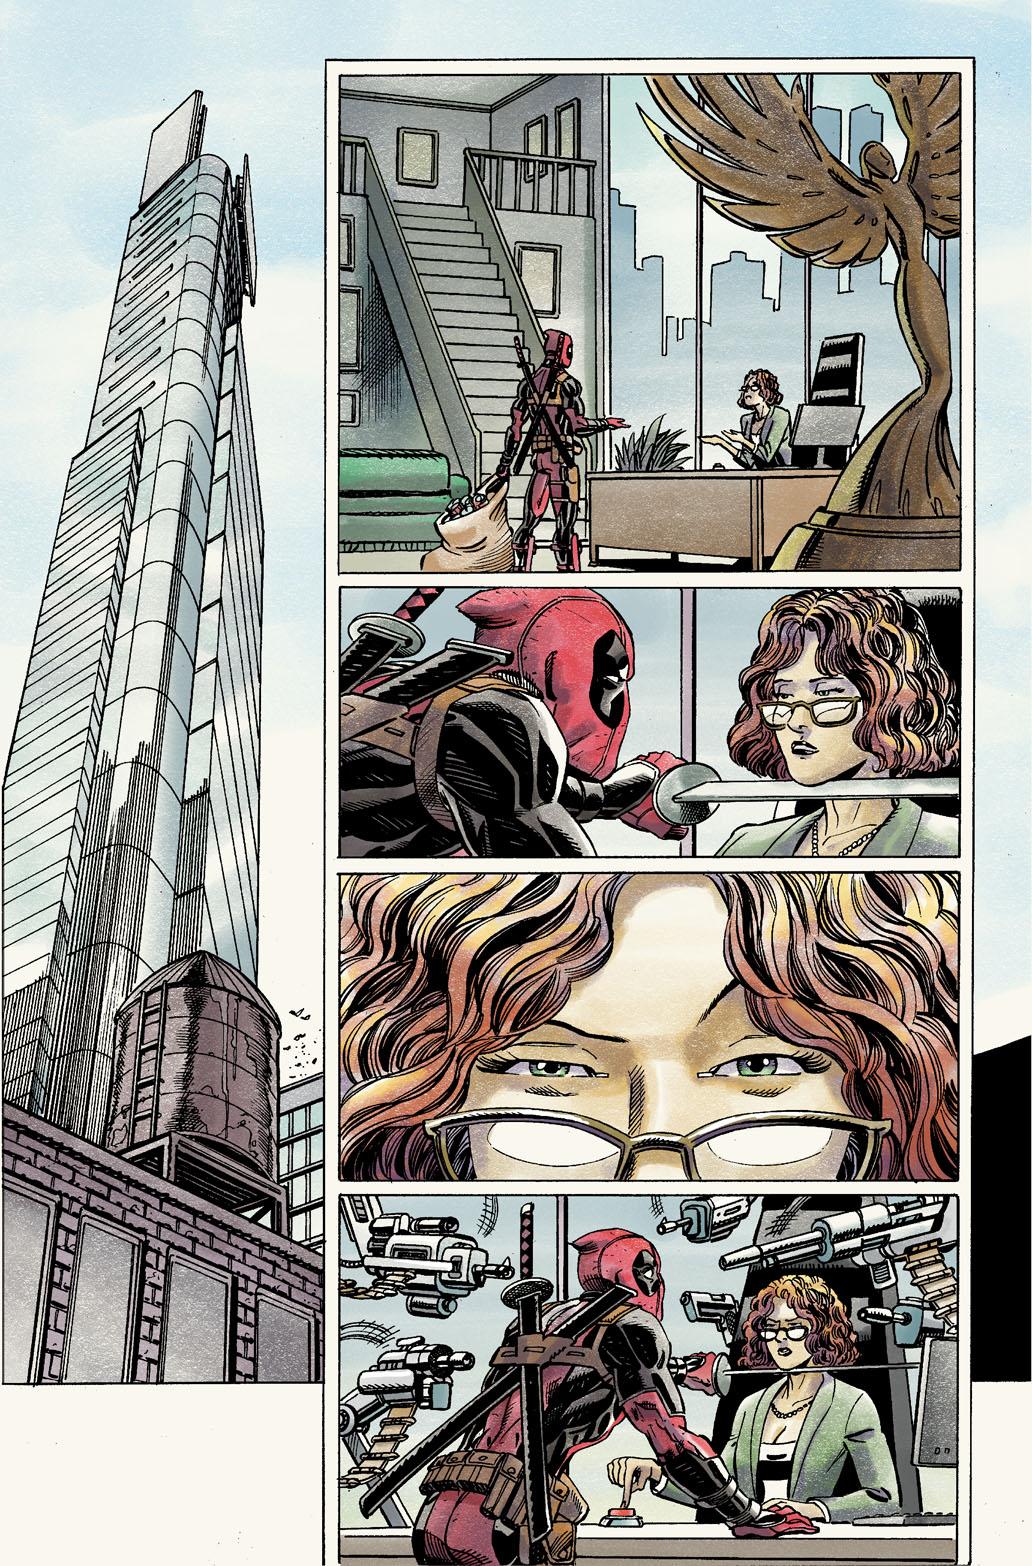 Deadpools_Art_of_War_1_Preview_4